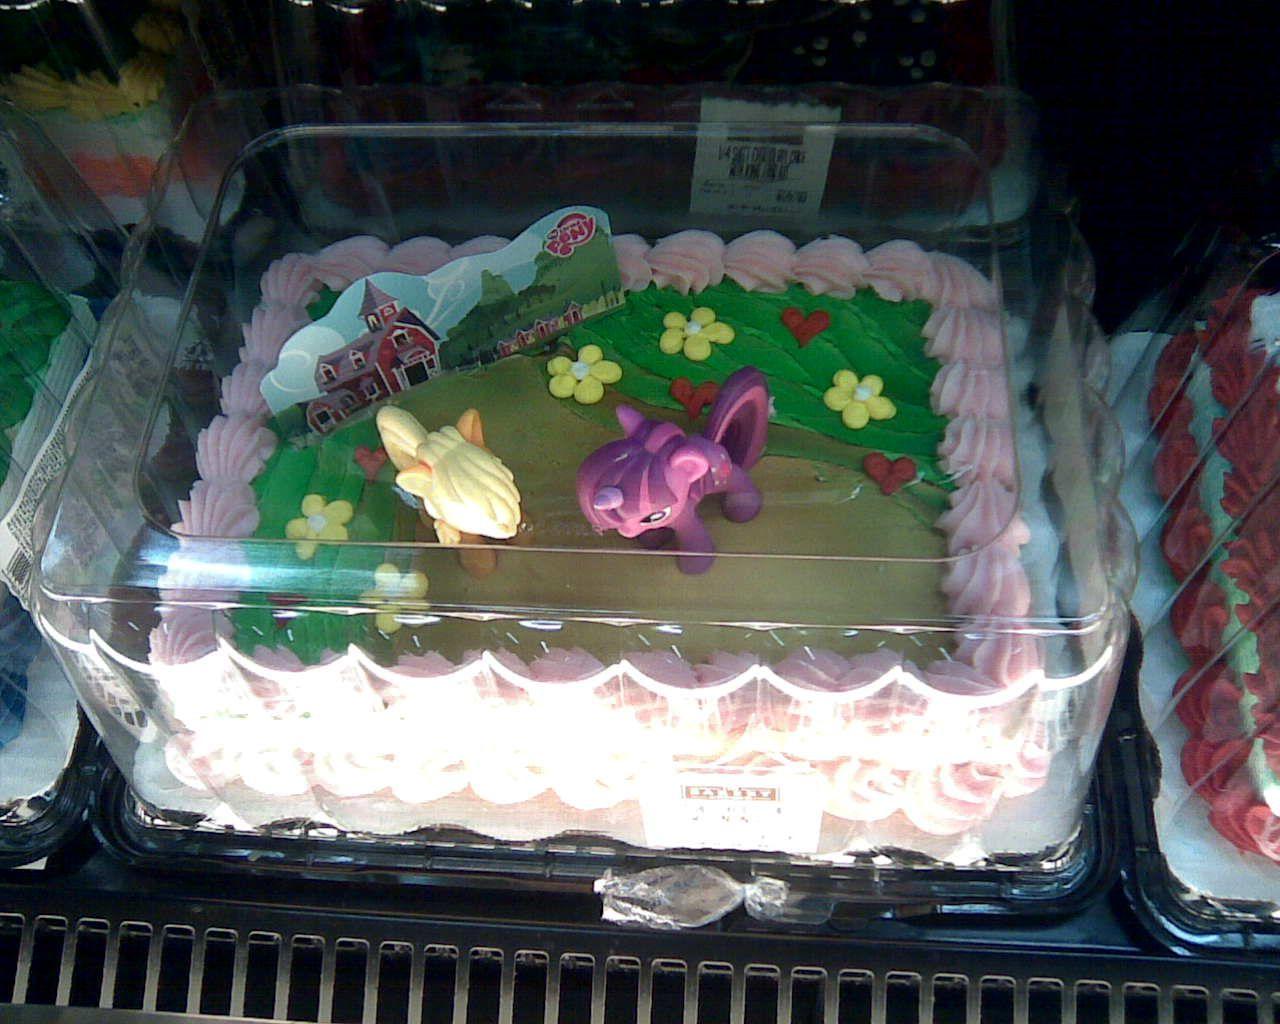 Groovy 6 Sams Club My Little Pony Cupcakes Photo My Little Pony Funny Birthday Cards Online Kookostrdamsfinfo